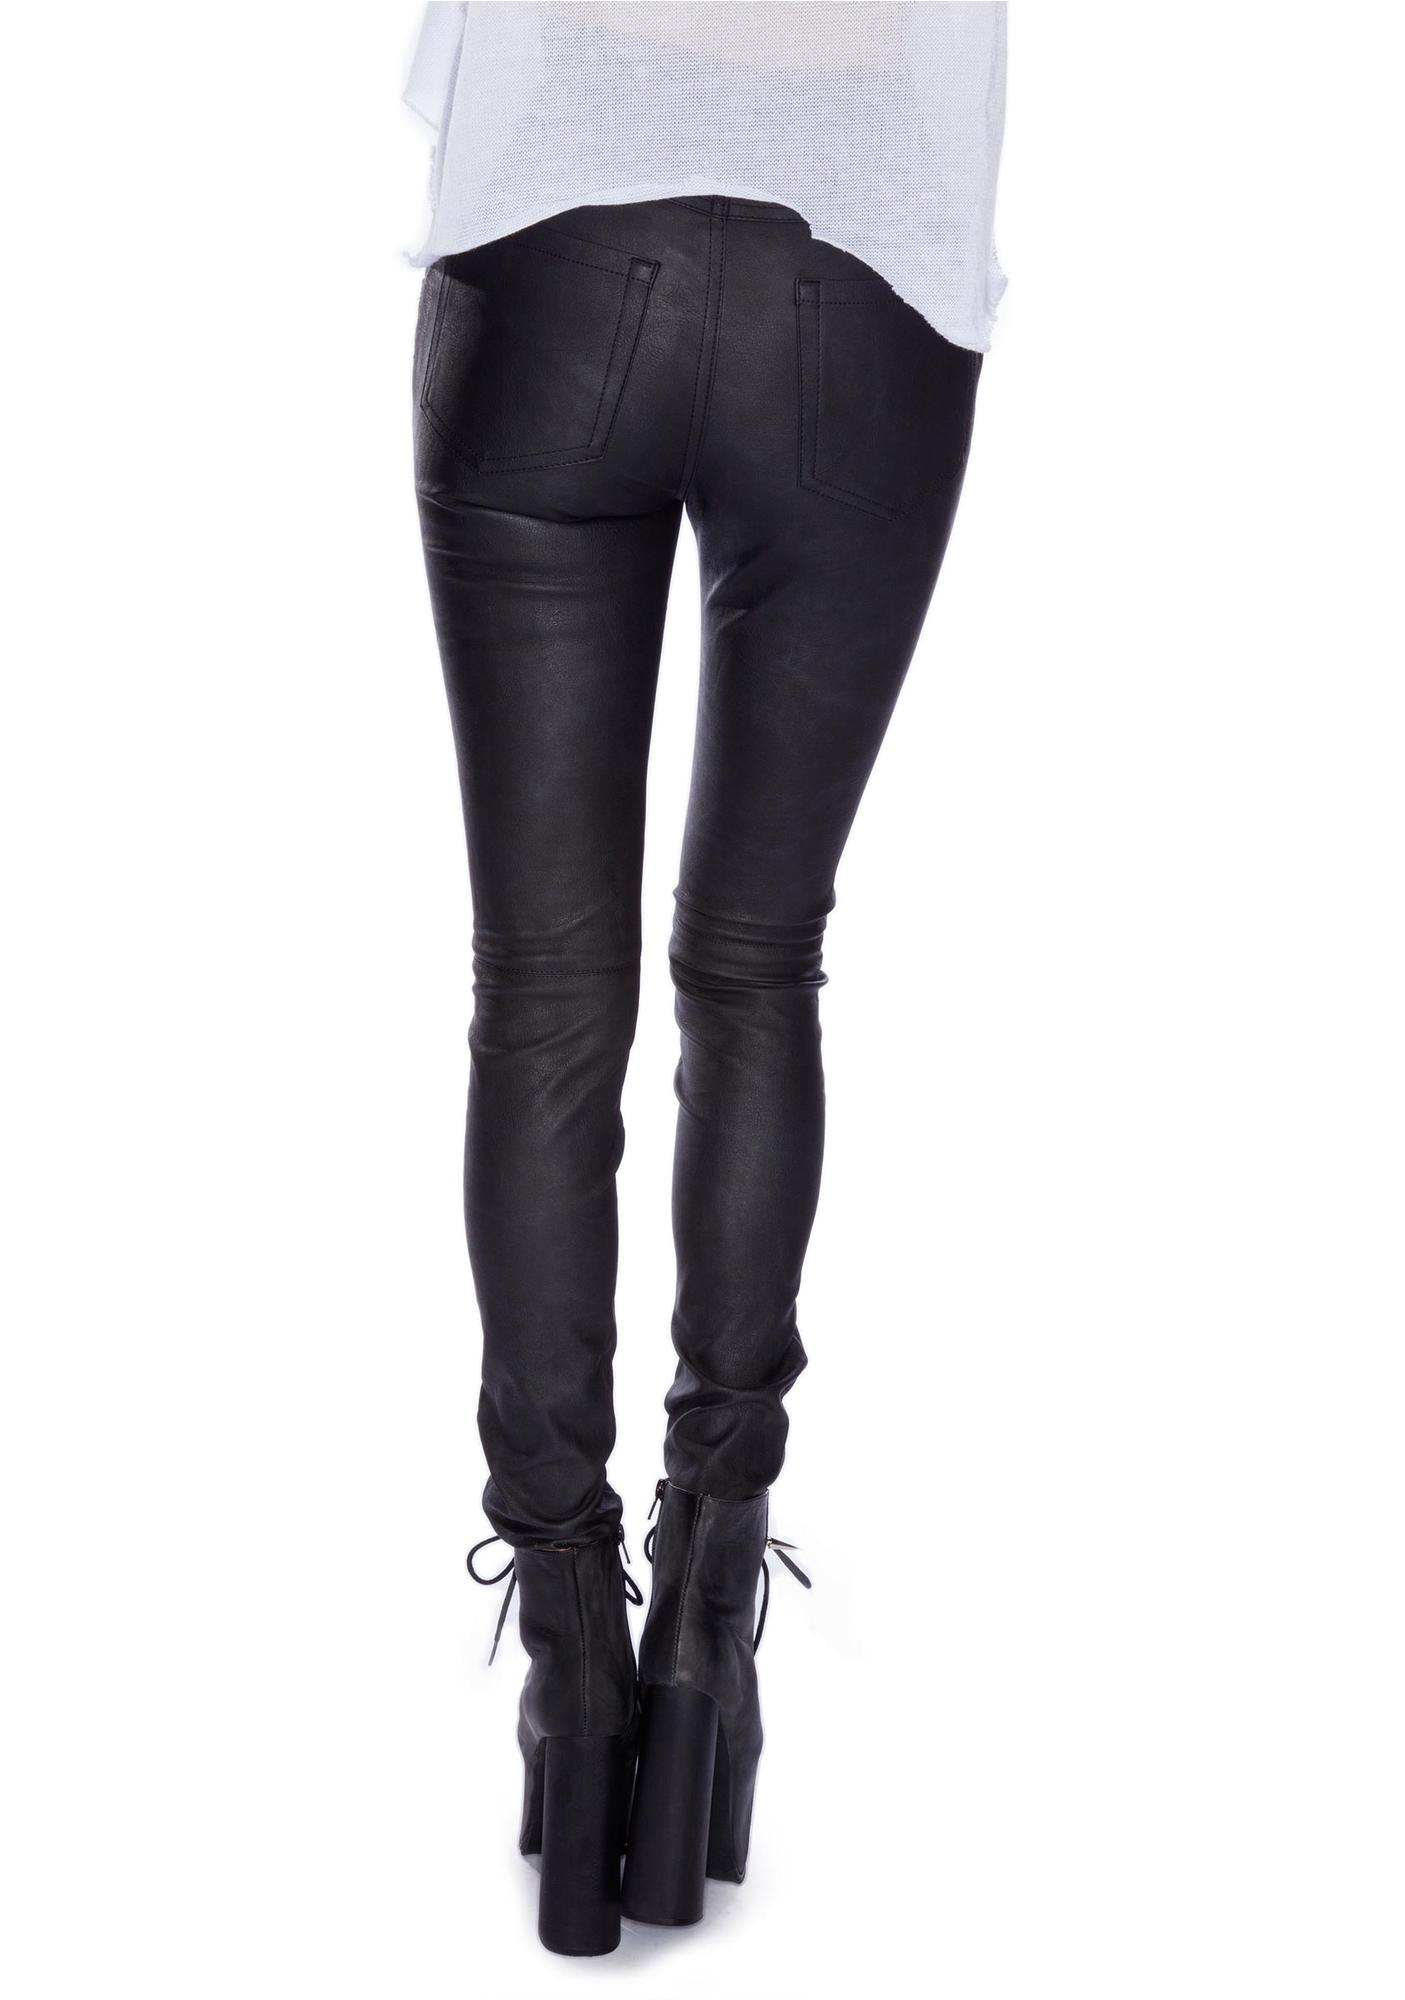 UNIF Axl Pants